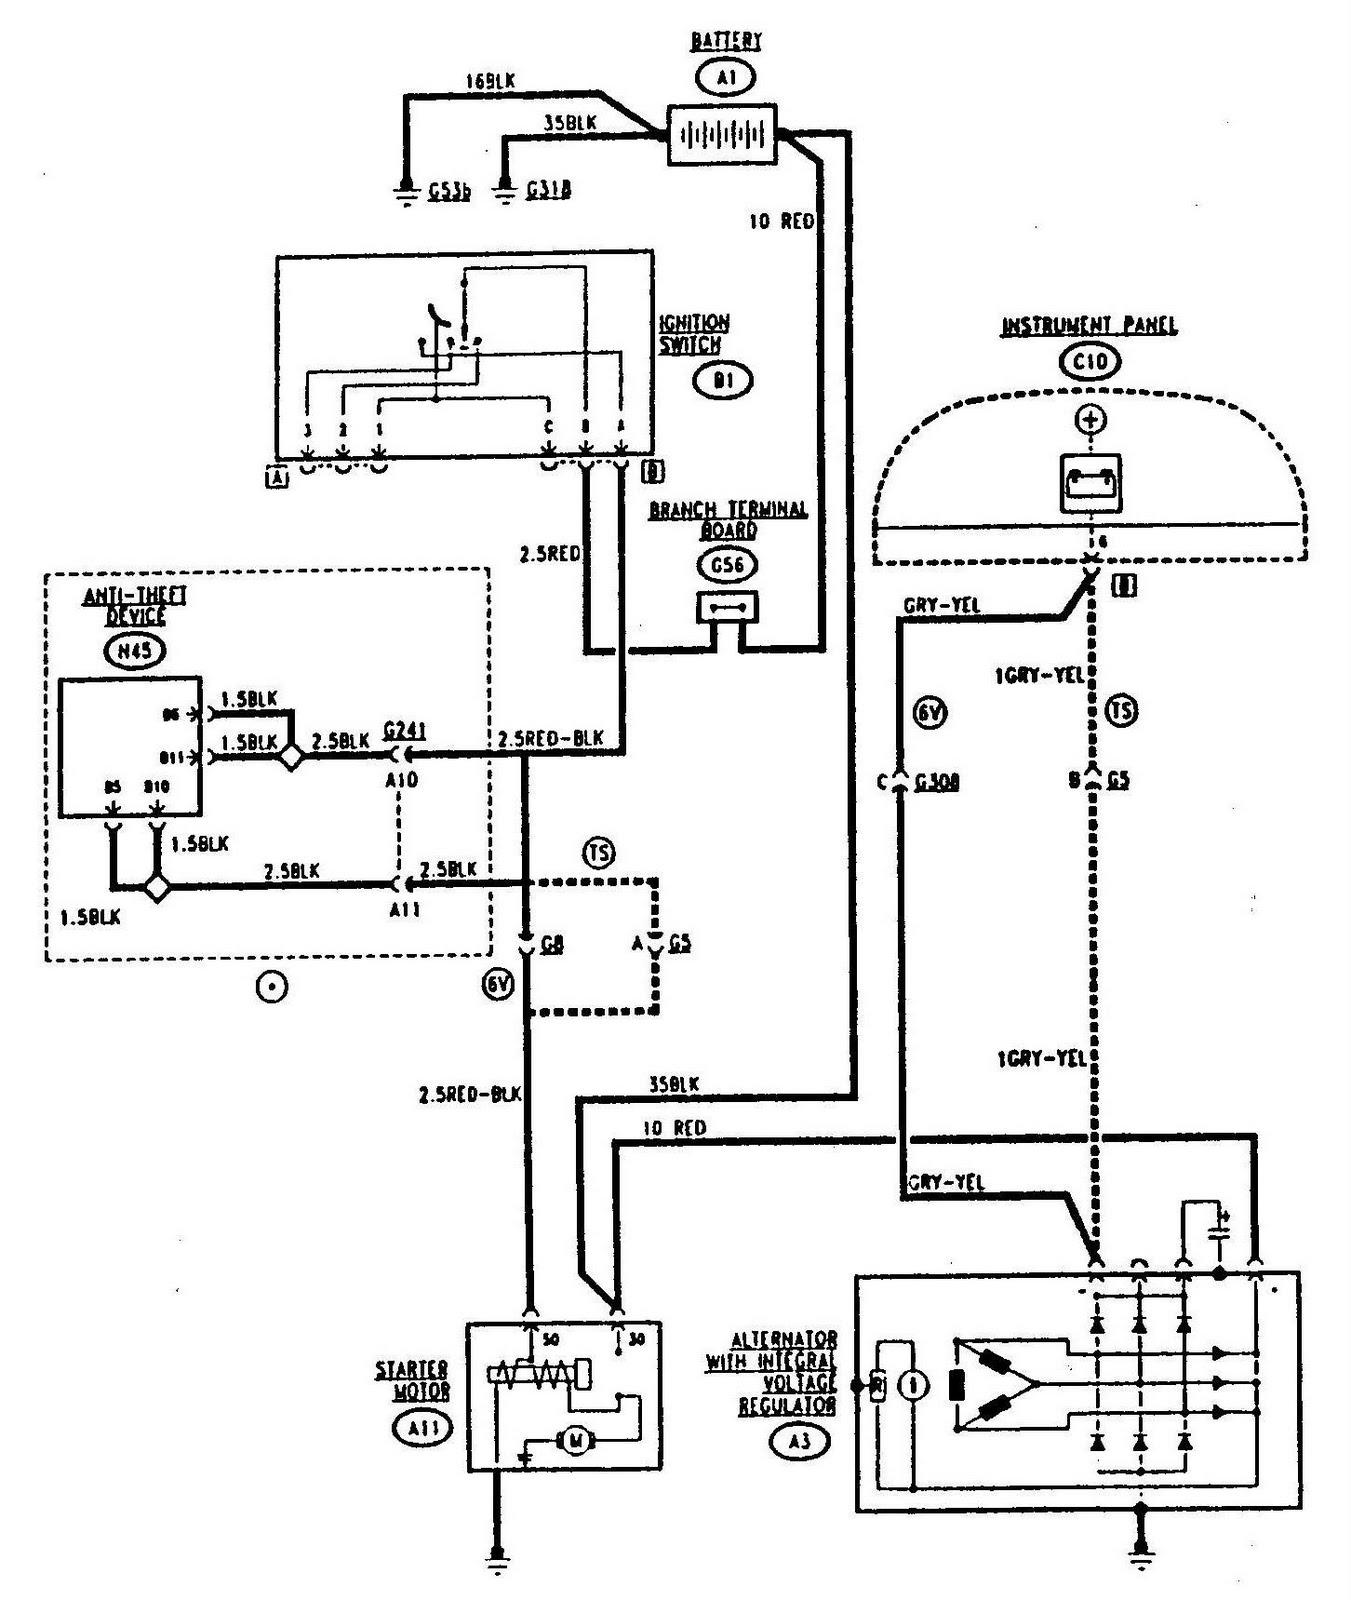 2011 chevy malibu ignition wiring diagram